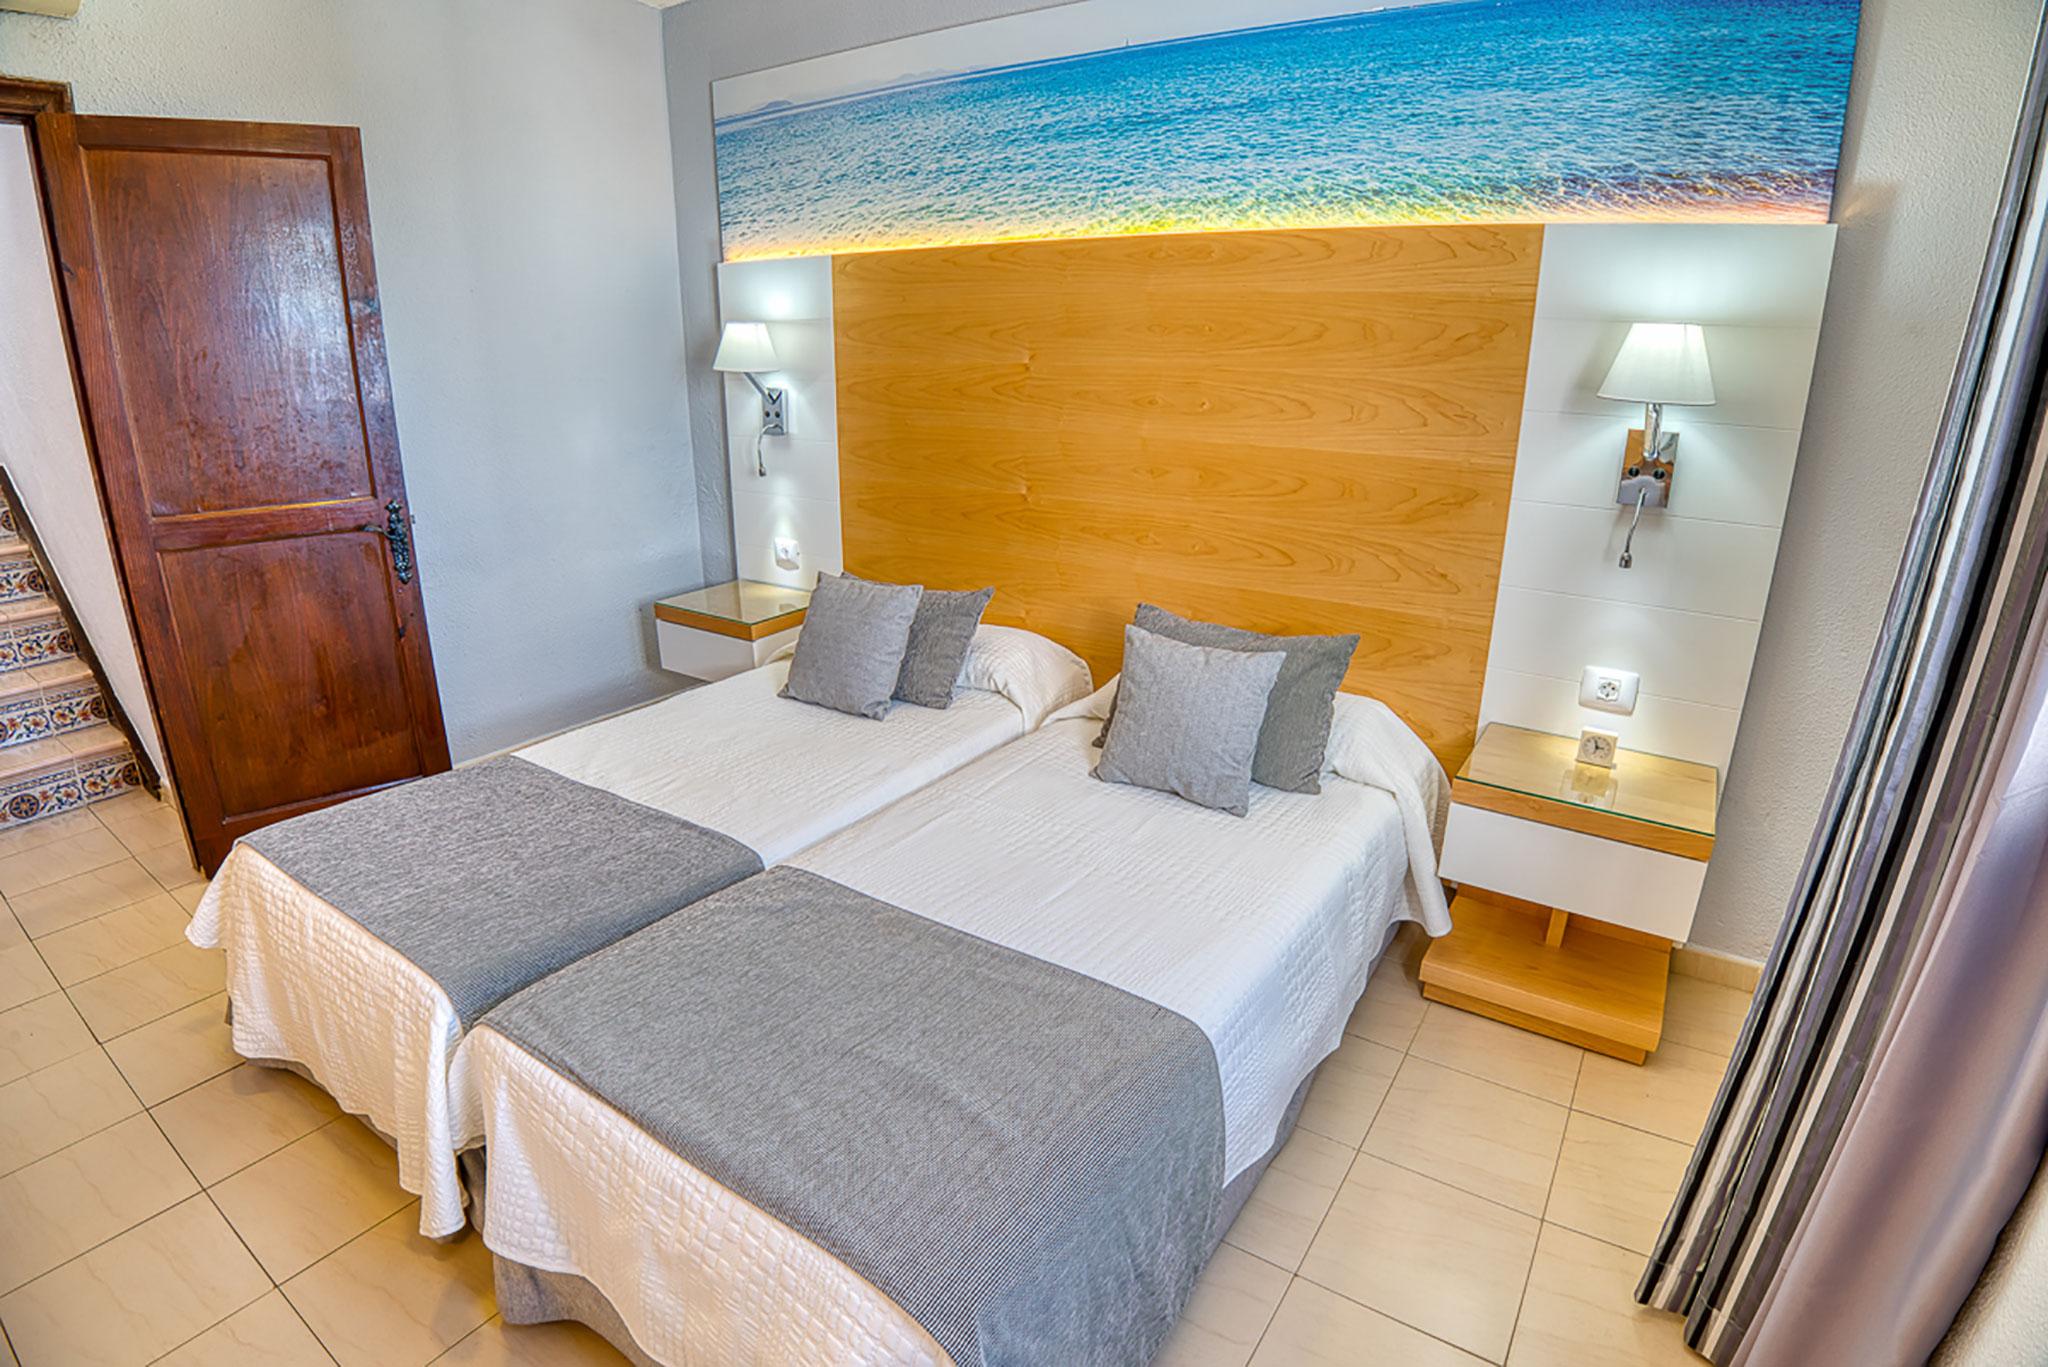 Hotel Rosas Bedroom Apartment